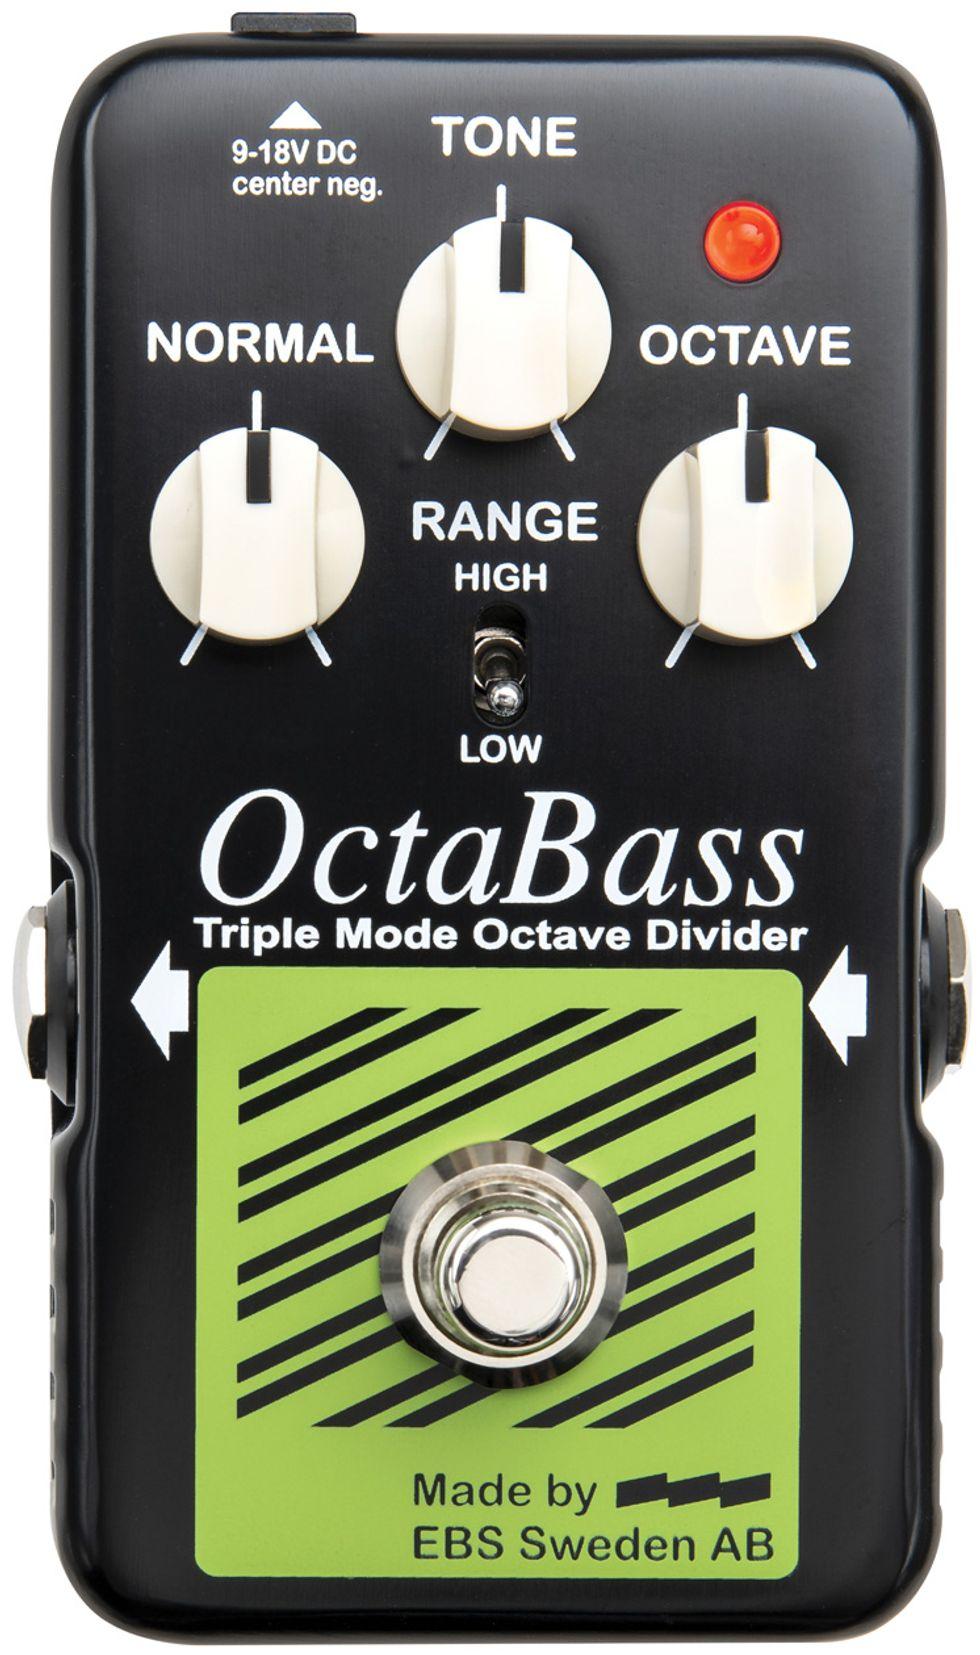 EBS OctaBass Blue Label: The Premier Guitar Review